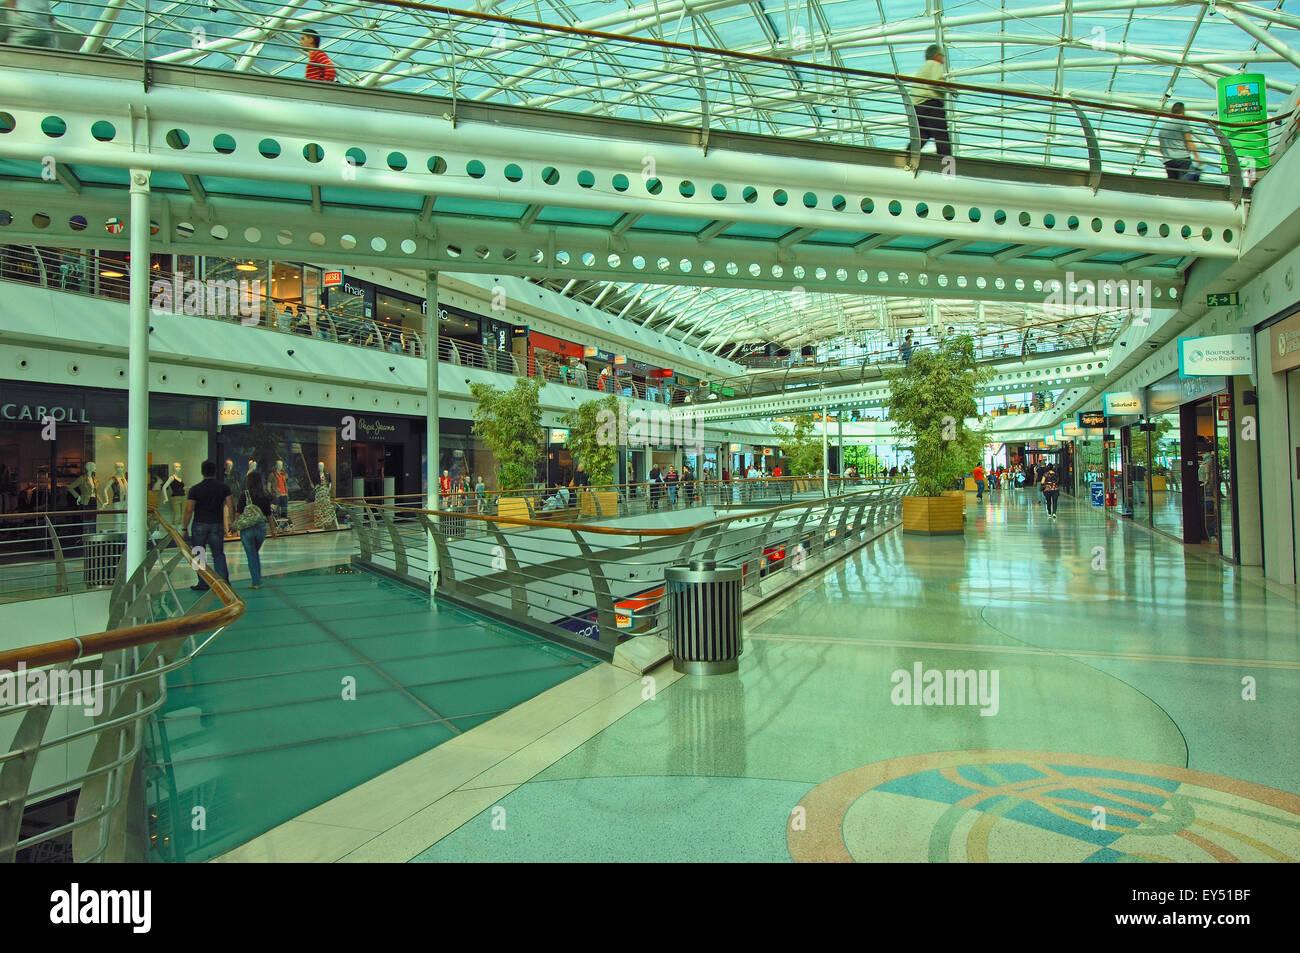 Vasco da Gama shopping centre at parque das na oes, site expo 98 ...